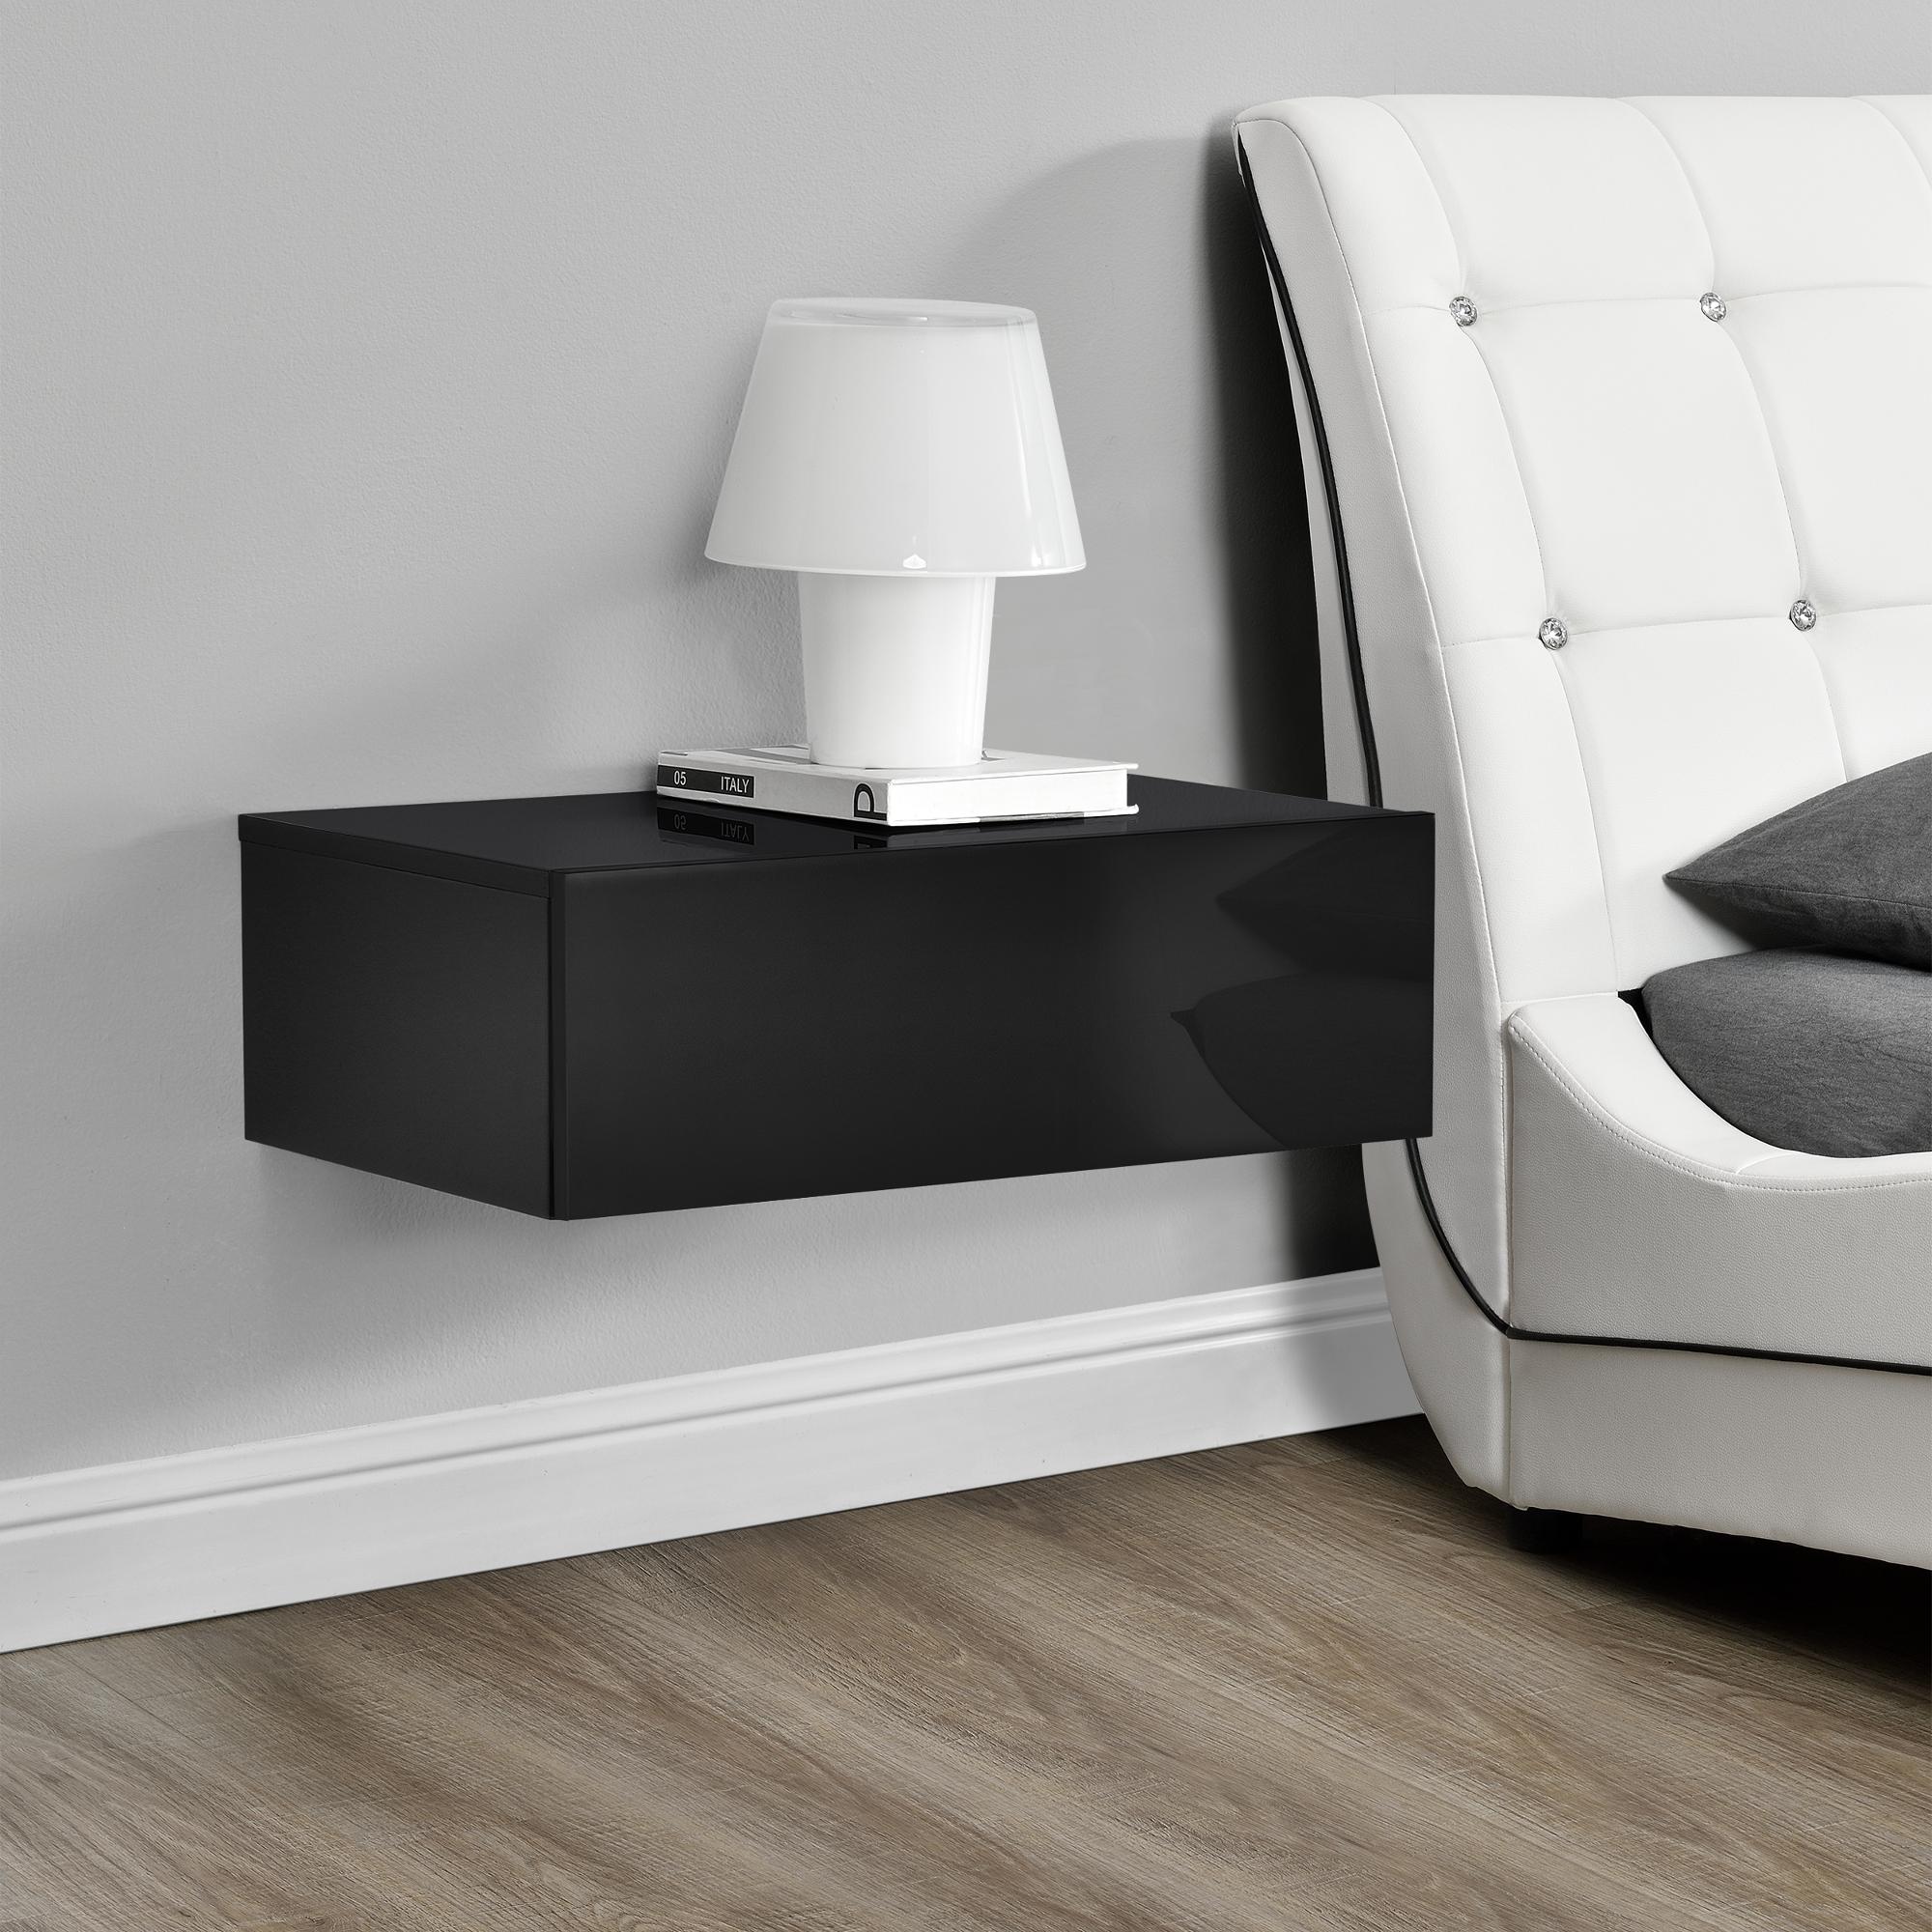 wandregal schublade schwarz hochglanz h ngeregal wand regal schrank ebay. Black Bedroom Furniture Sets. Home Design Ideas